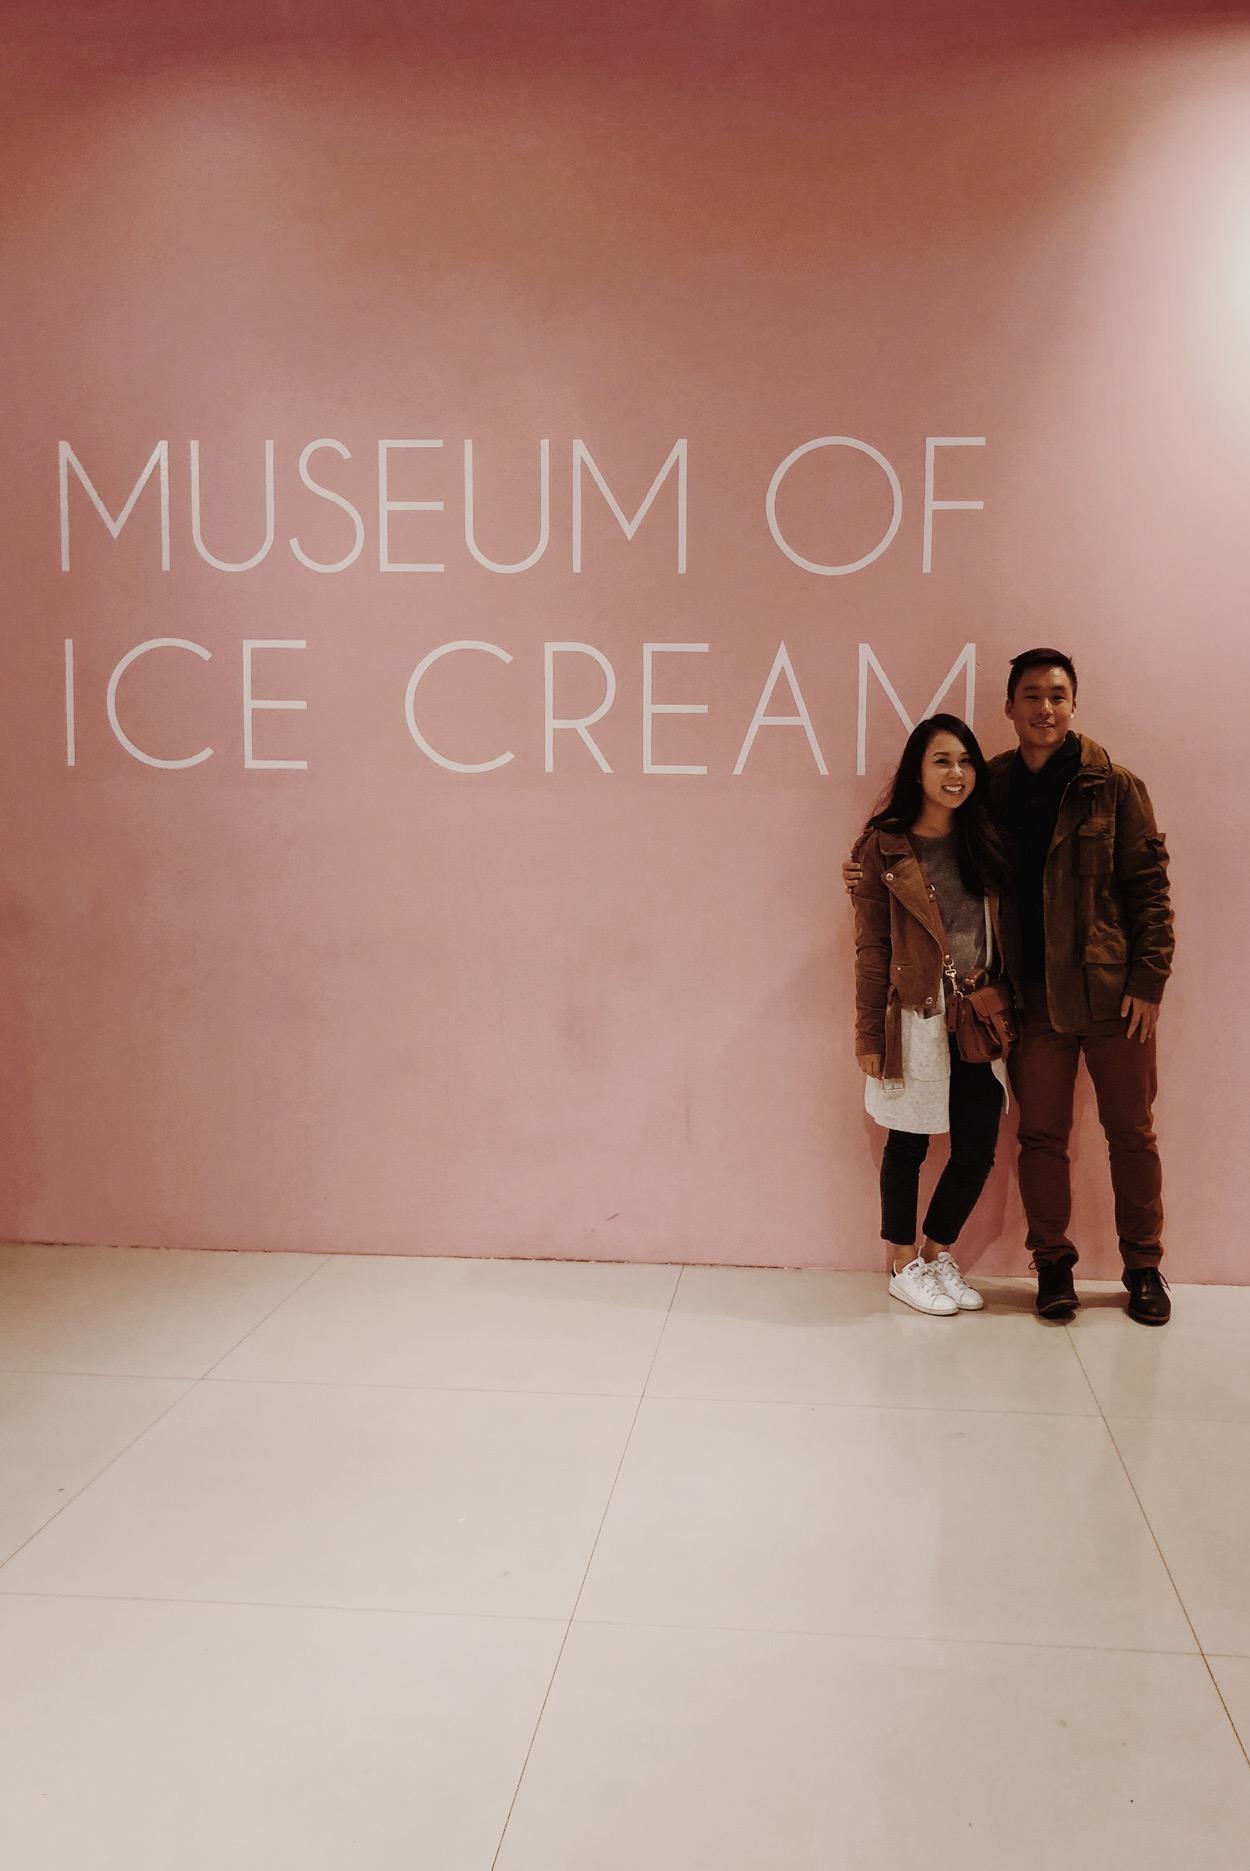 Museum of Ice Cream Milennial Pink